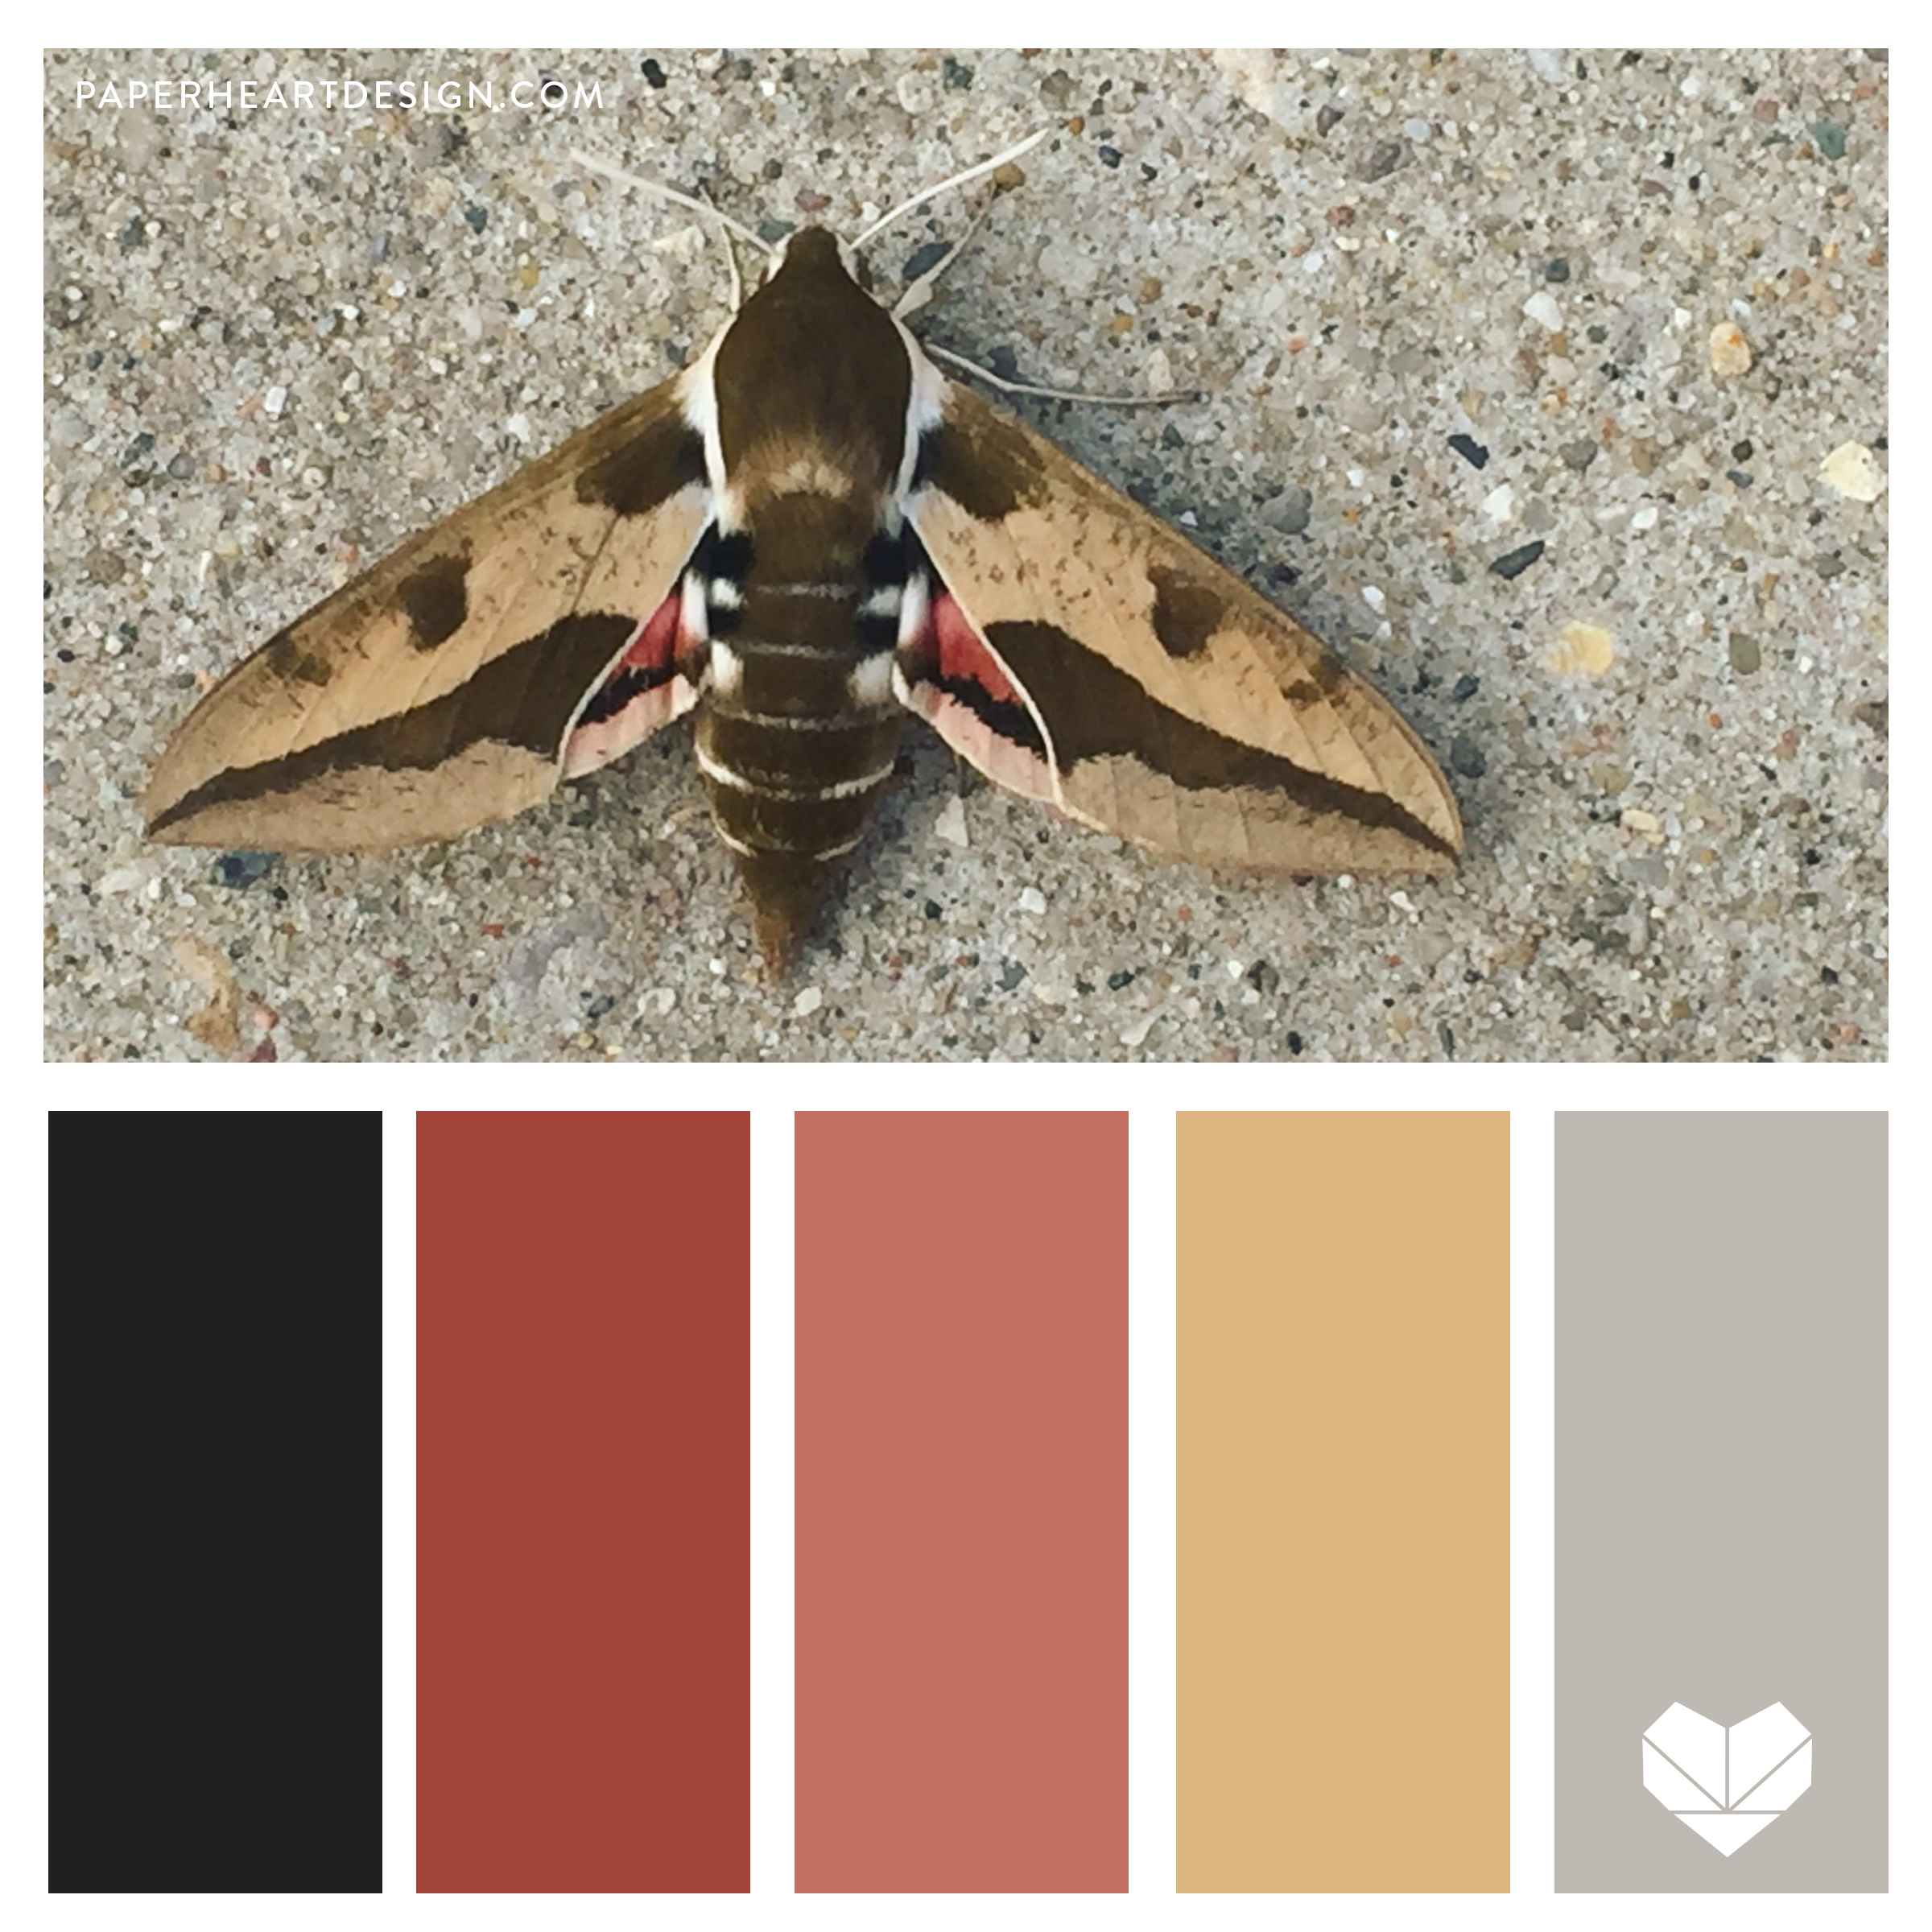 Moth Spurge Hawk Moth.jpg